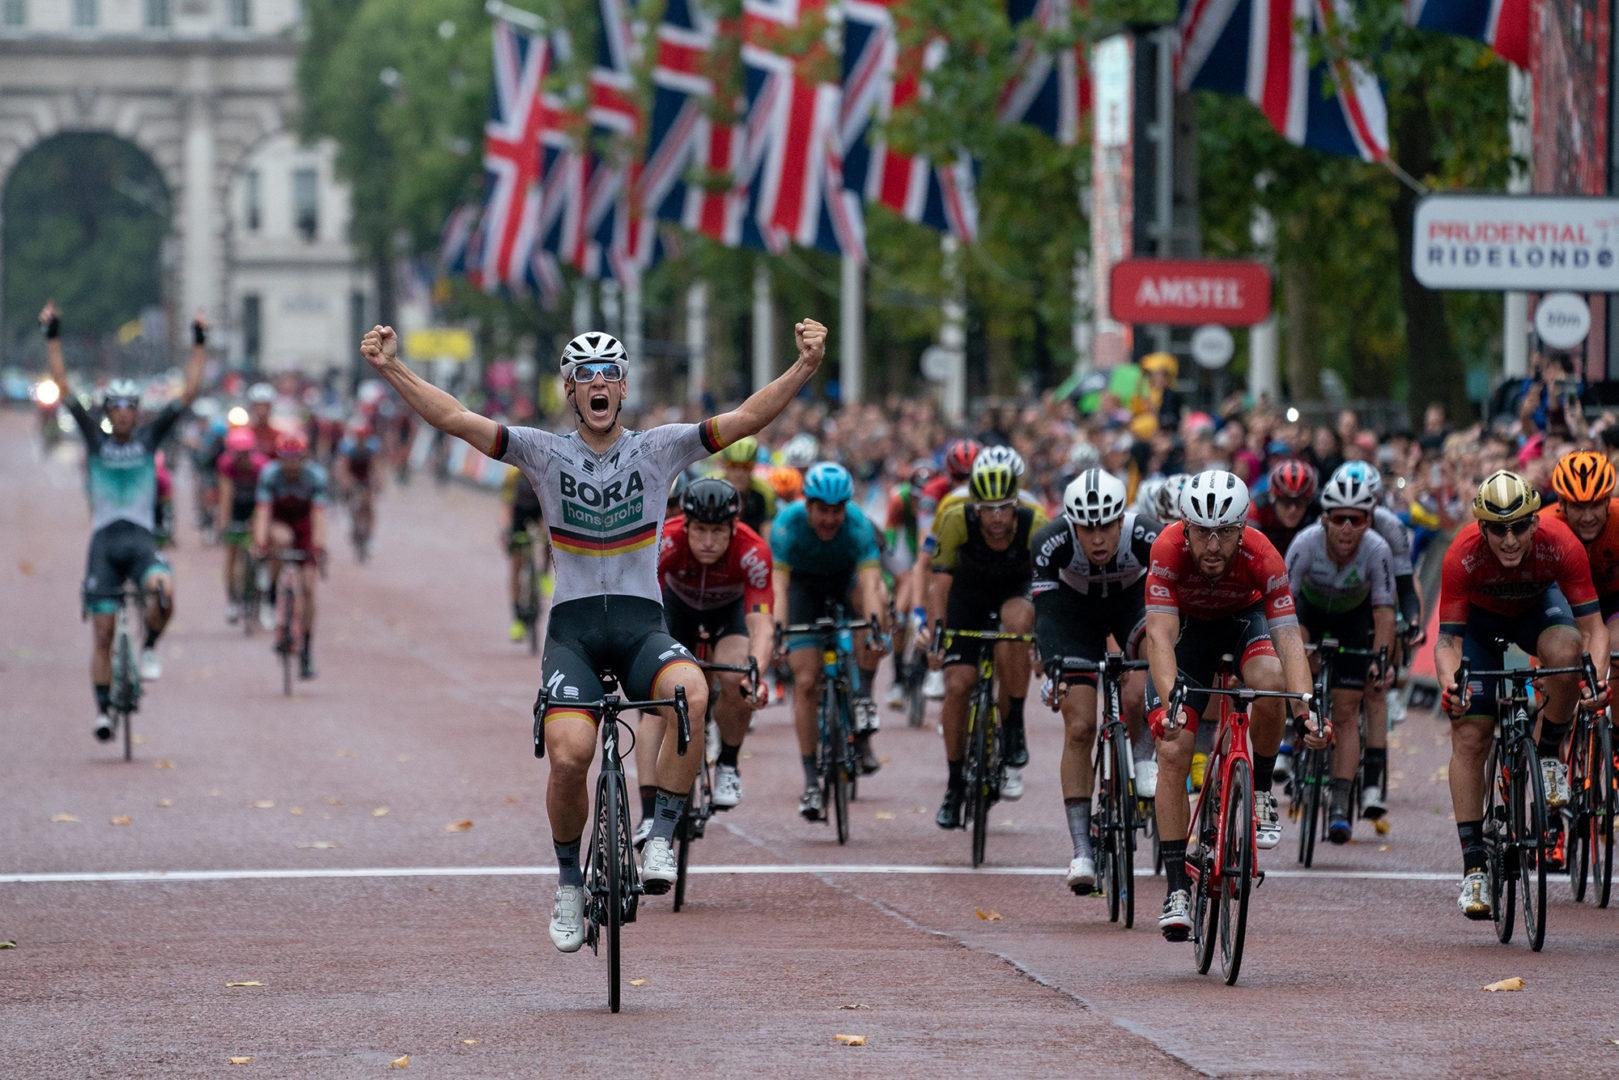 Prudential Ride London Surrey Classic 2019